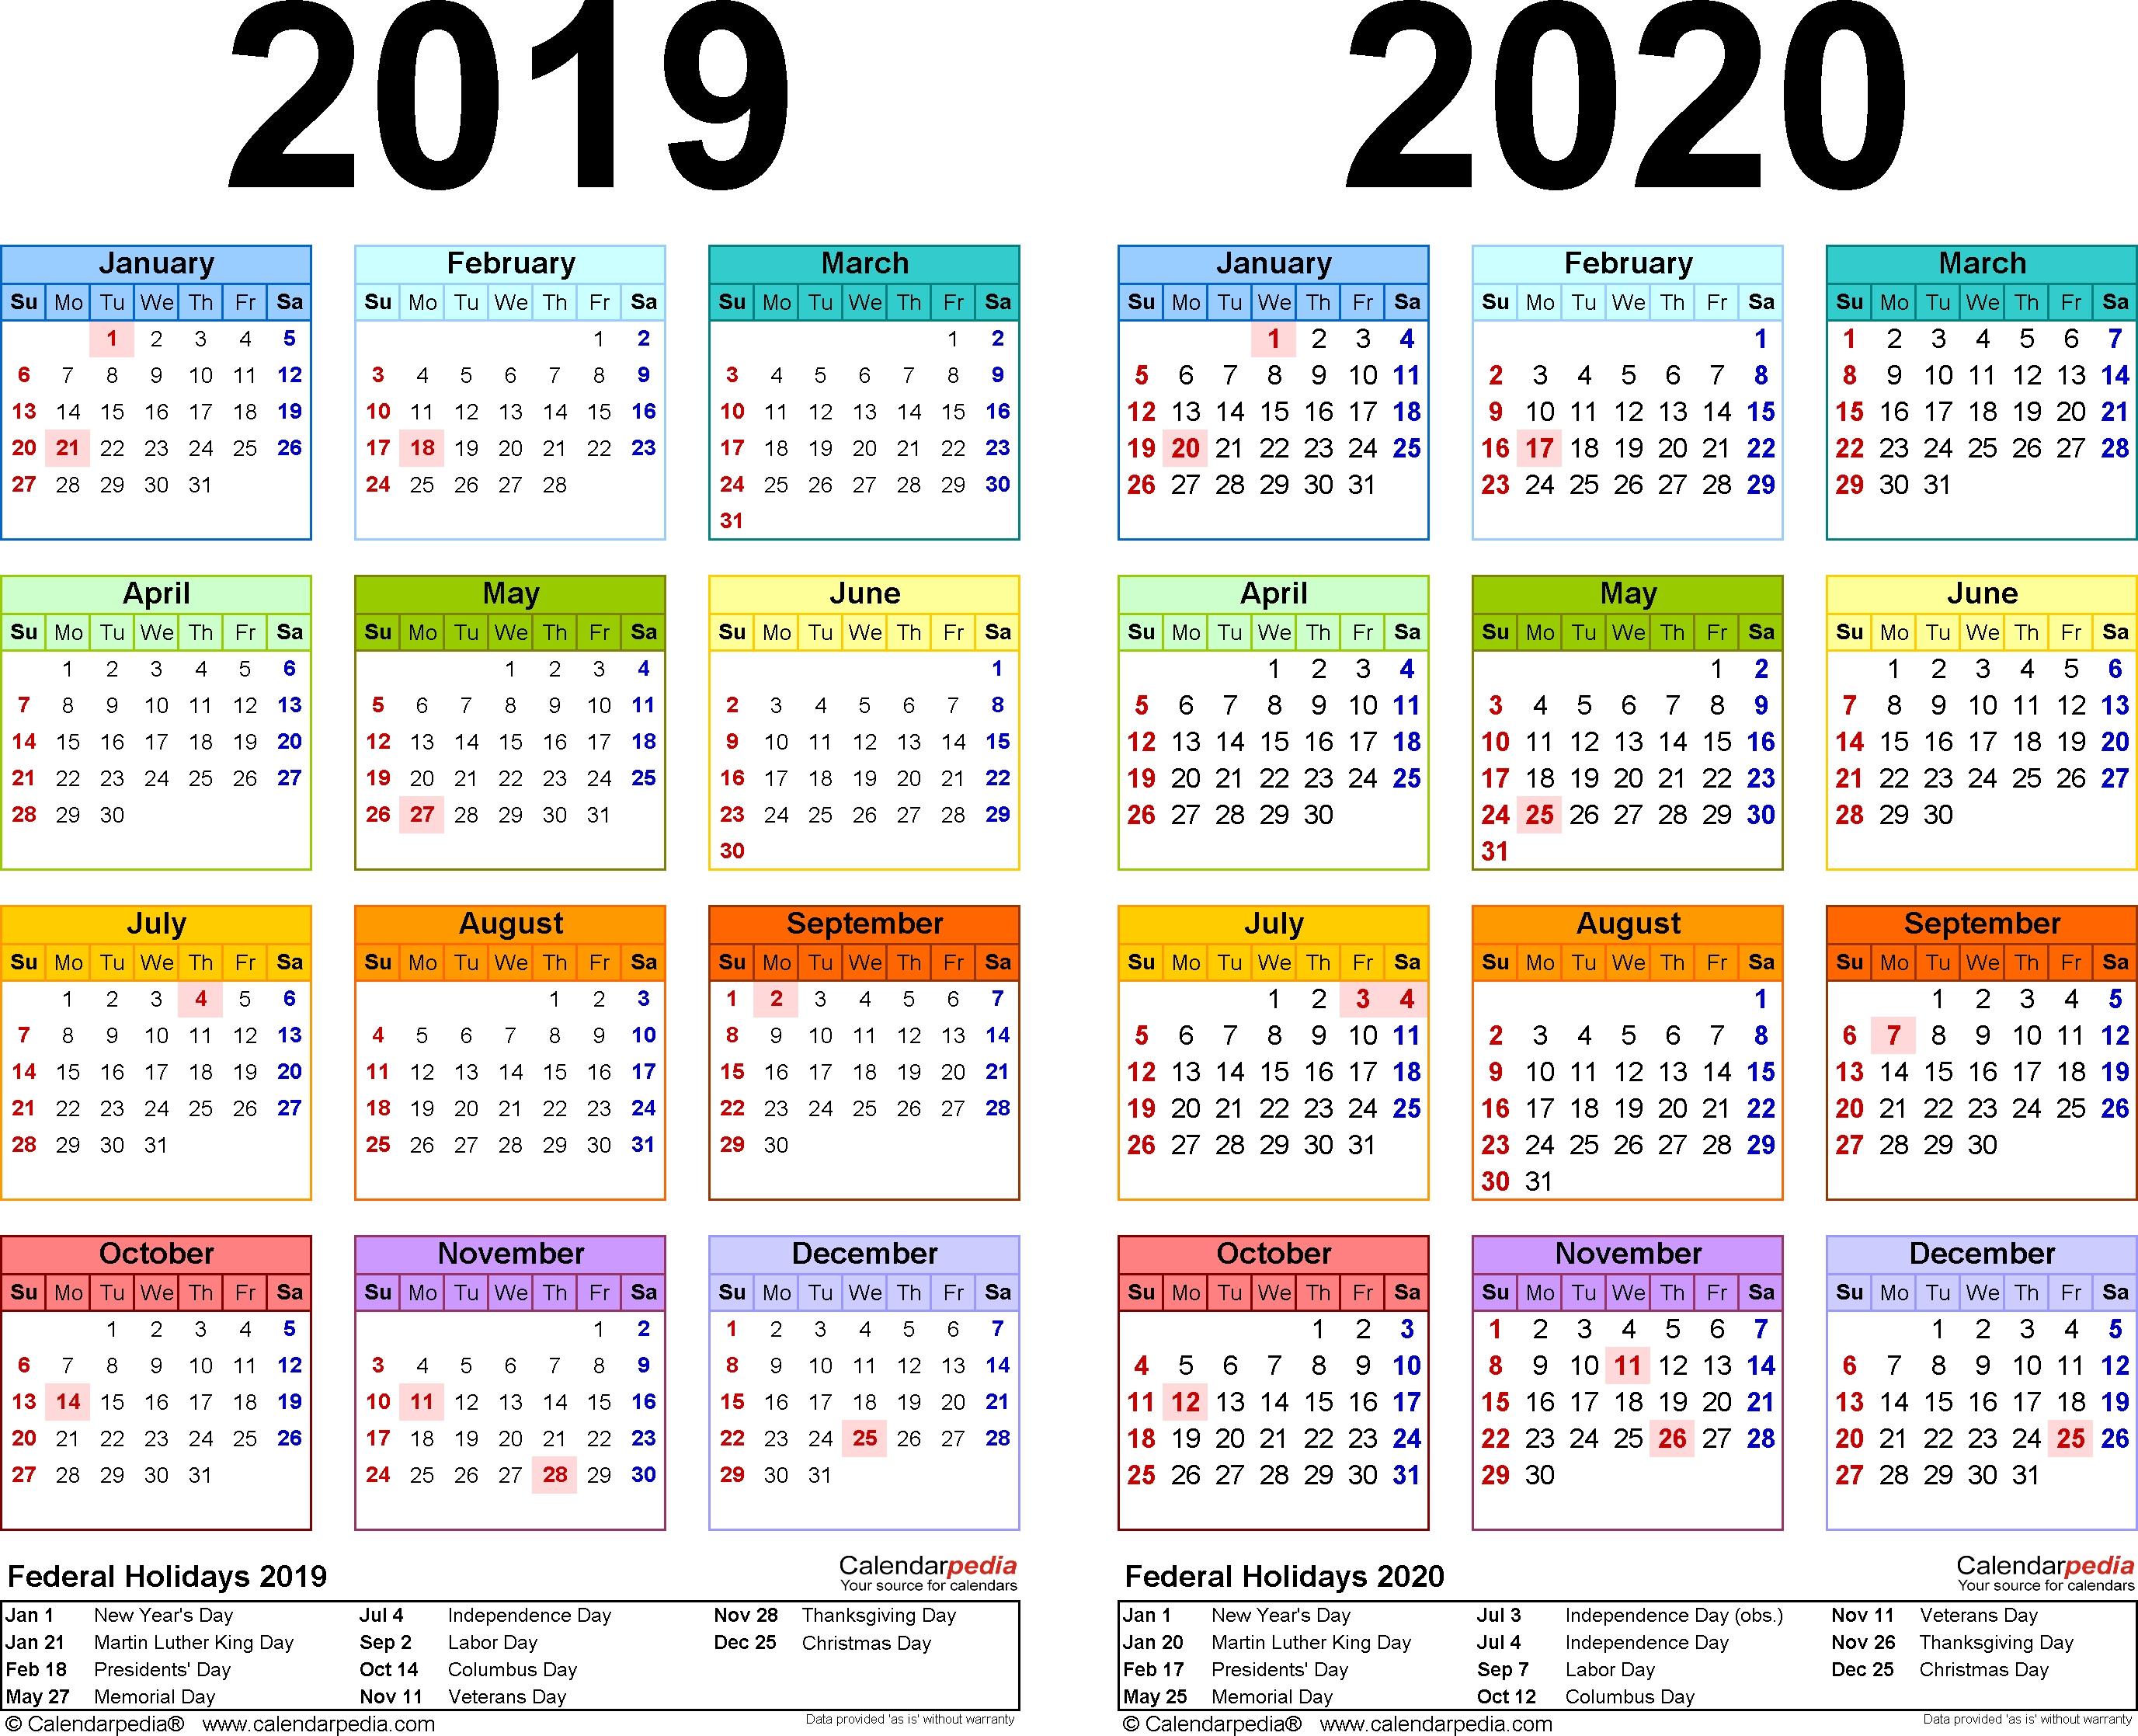 2019-2020 Calendar - Free Printable Two-Year Pdf Calendars pertaining to Google Annual Calendar 2019-2020